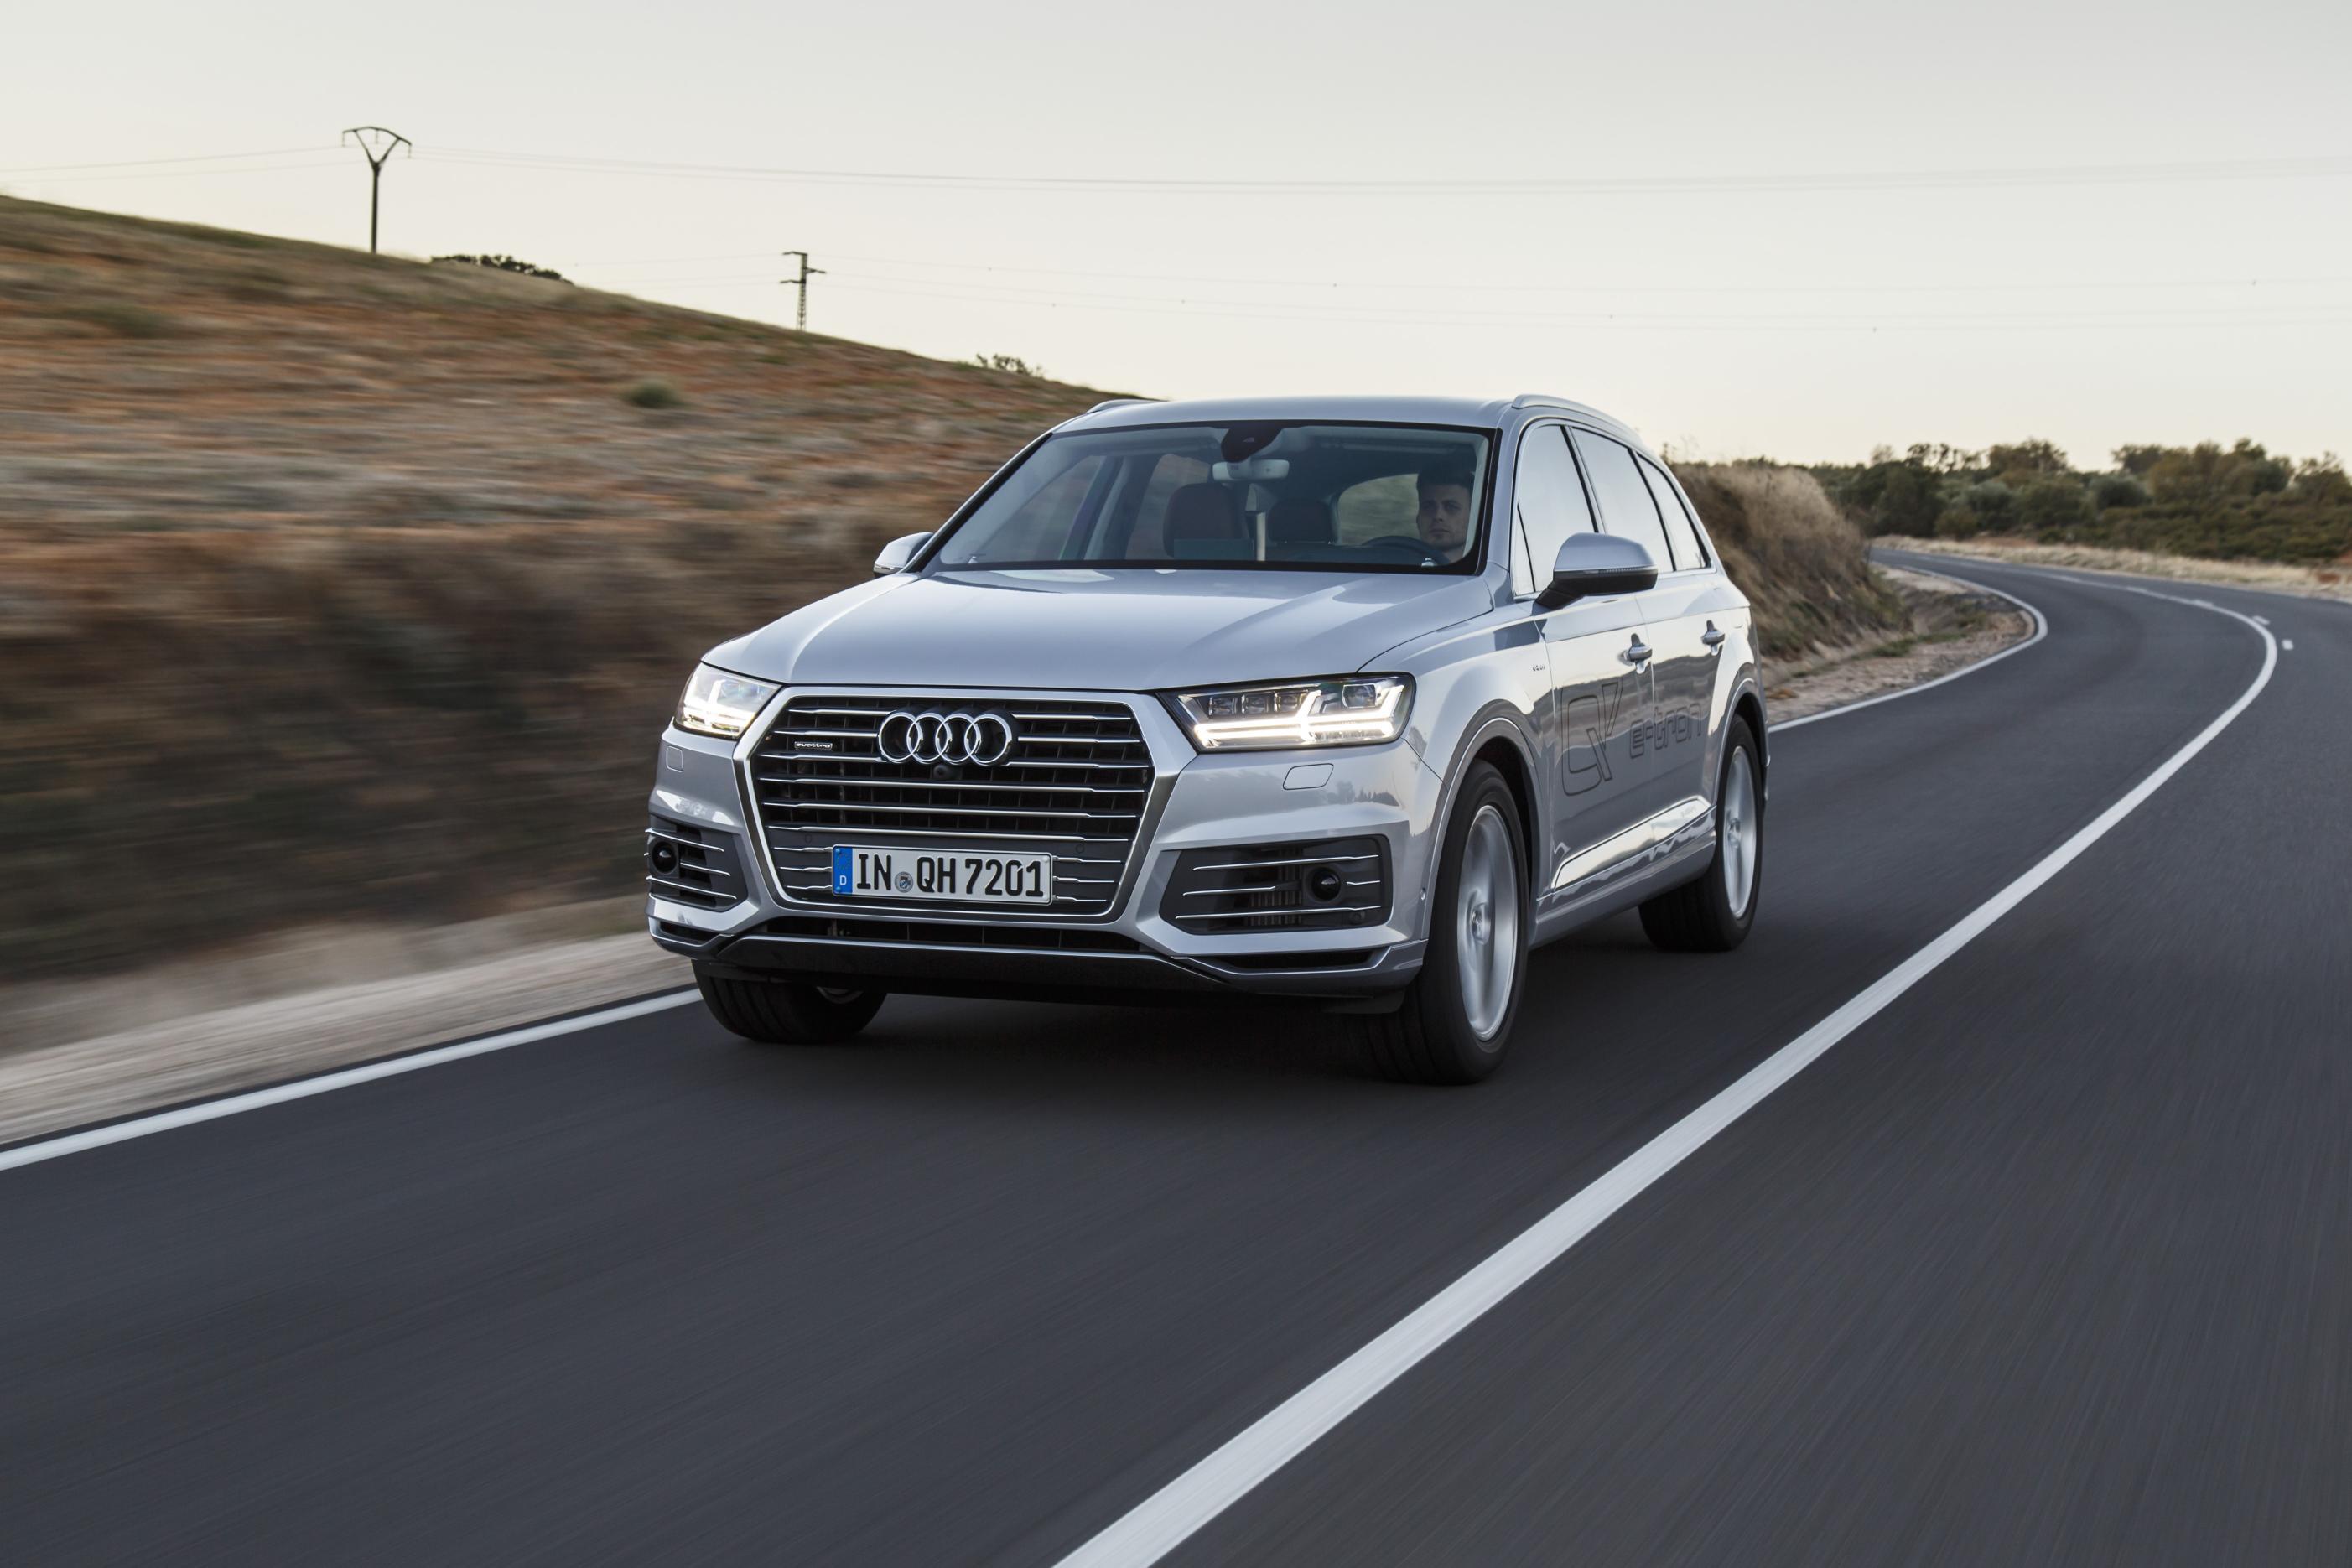 Audi Q7 e-tron 1